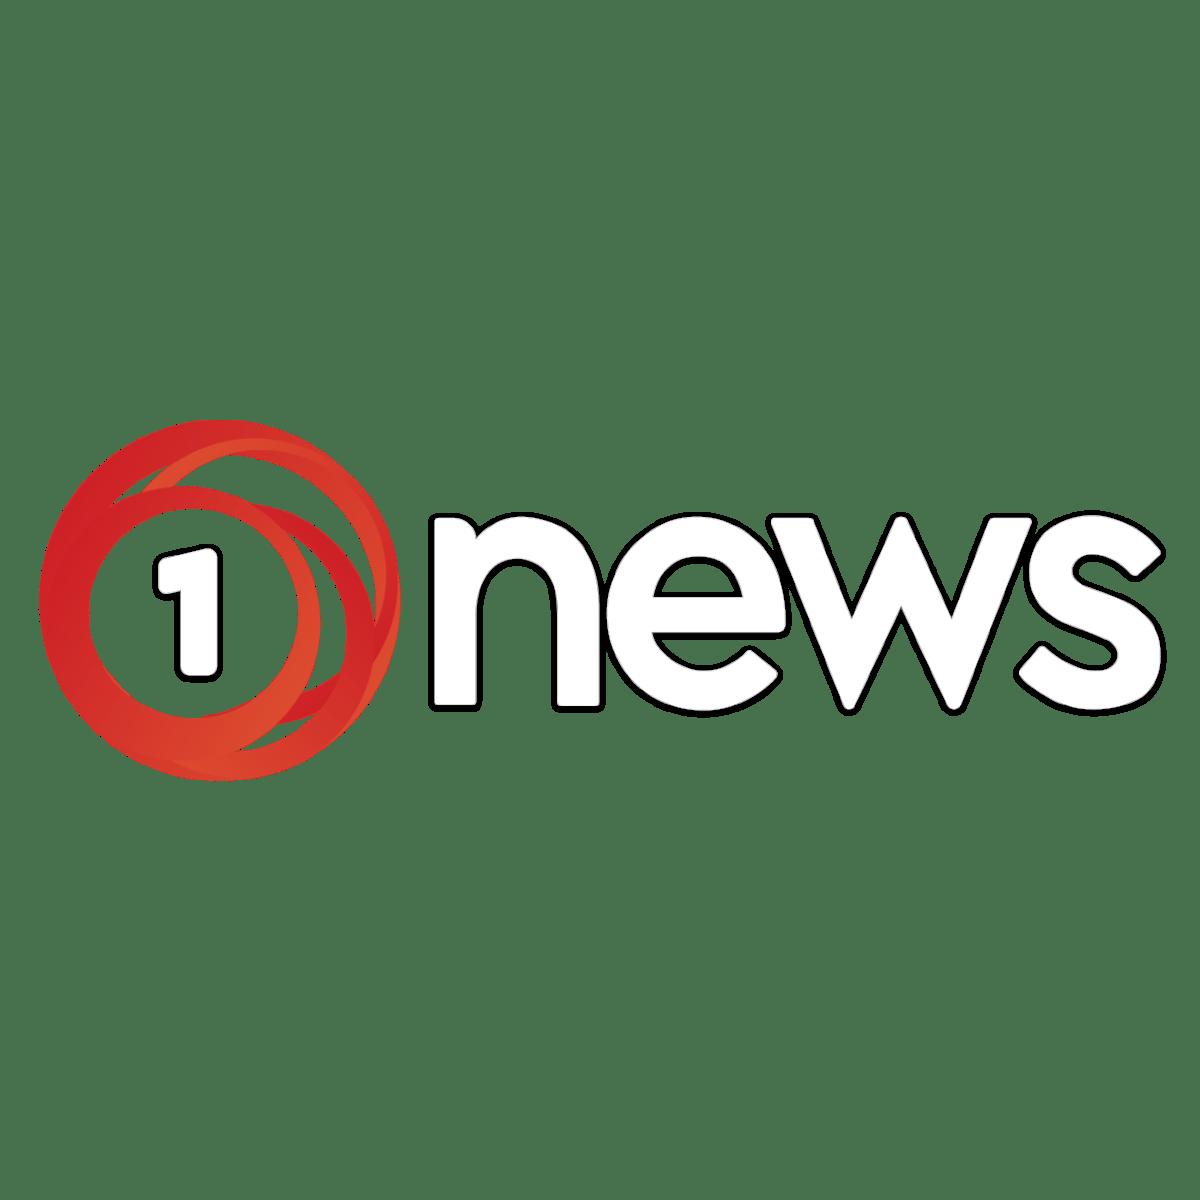 Logo-2-1-News.png